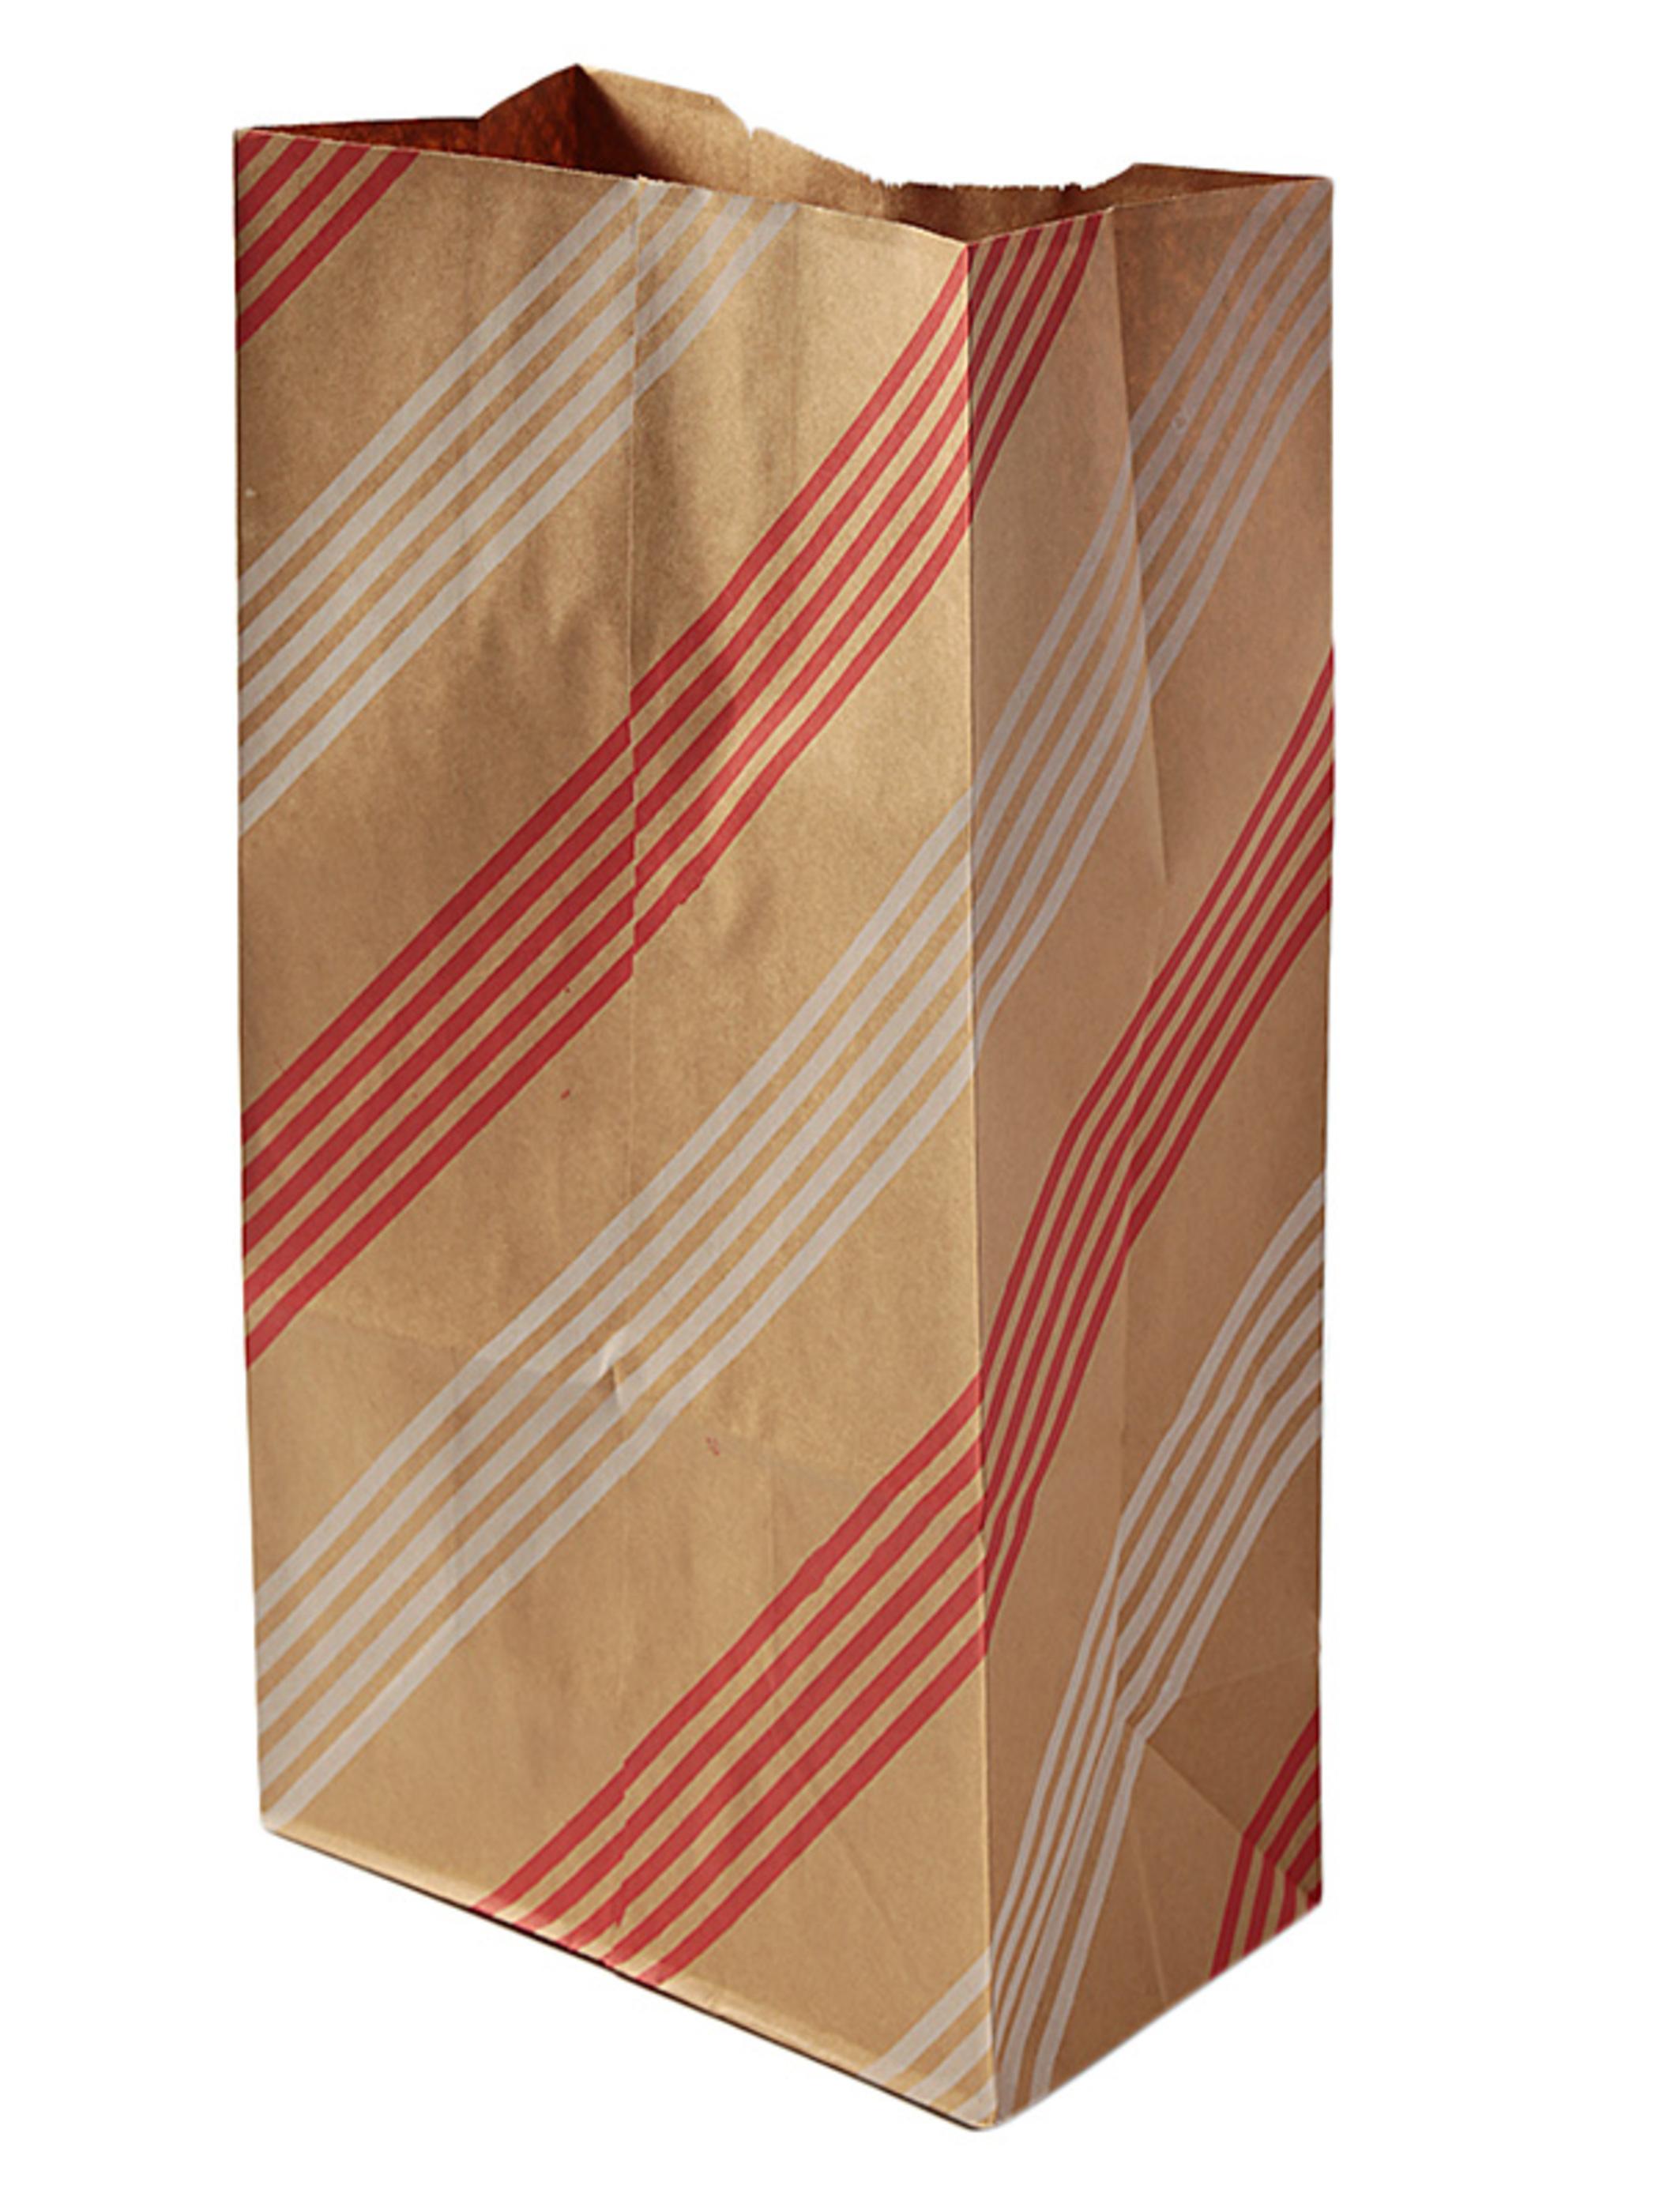 US Military / 1970's-1980's Deadstock Paper Shopping Bag